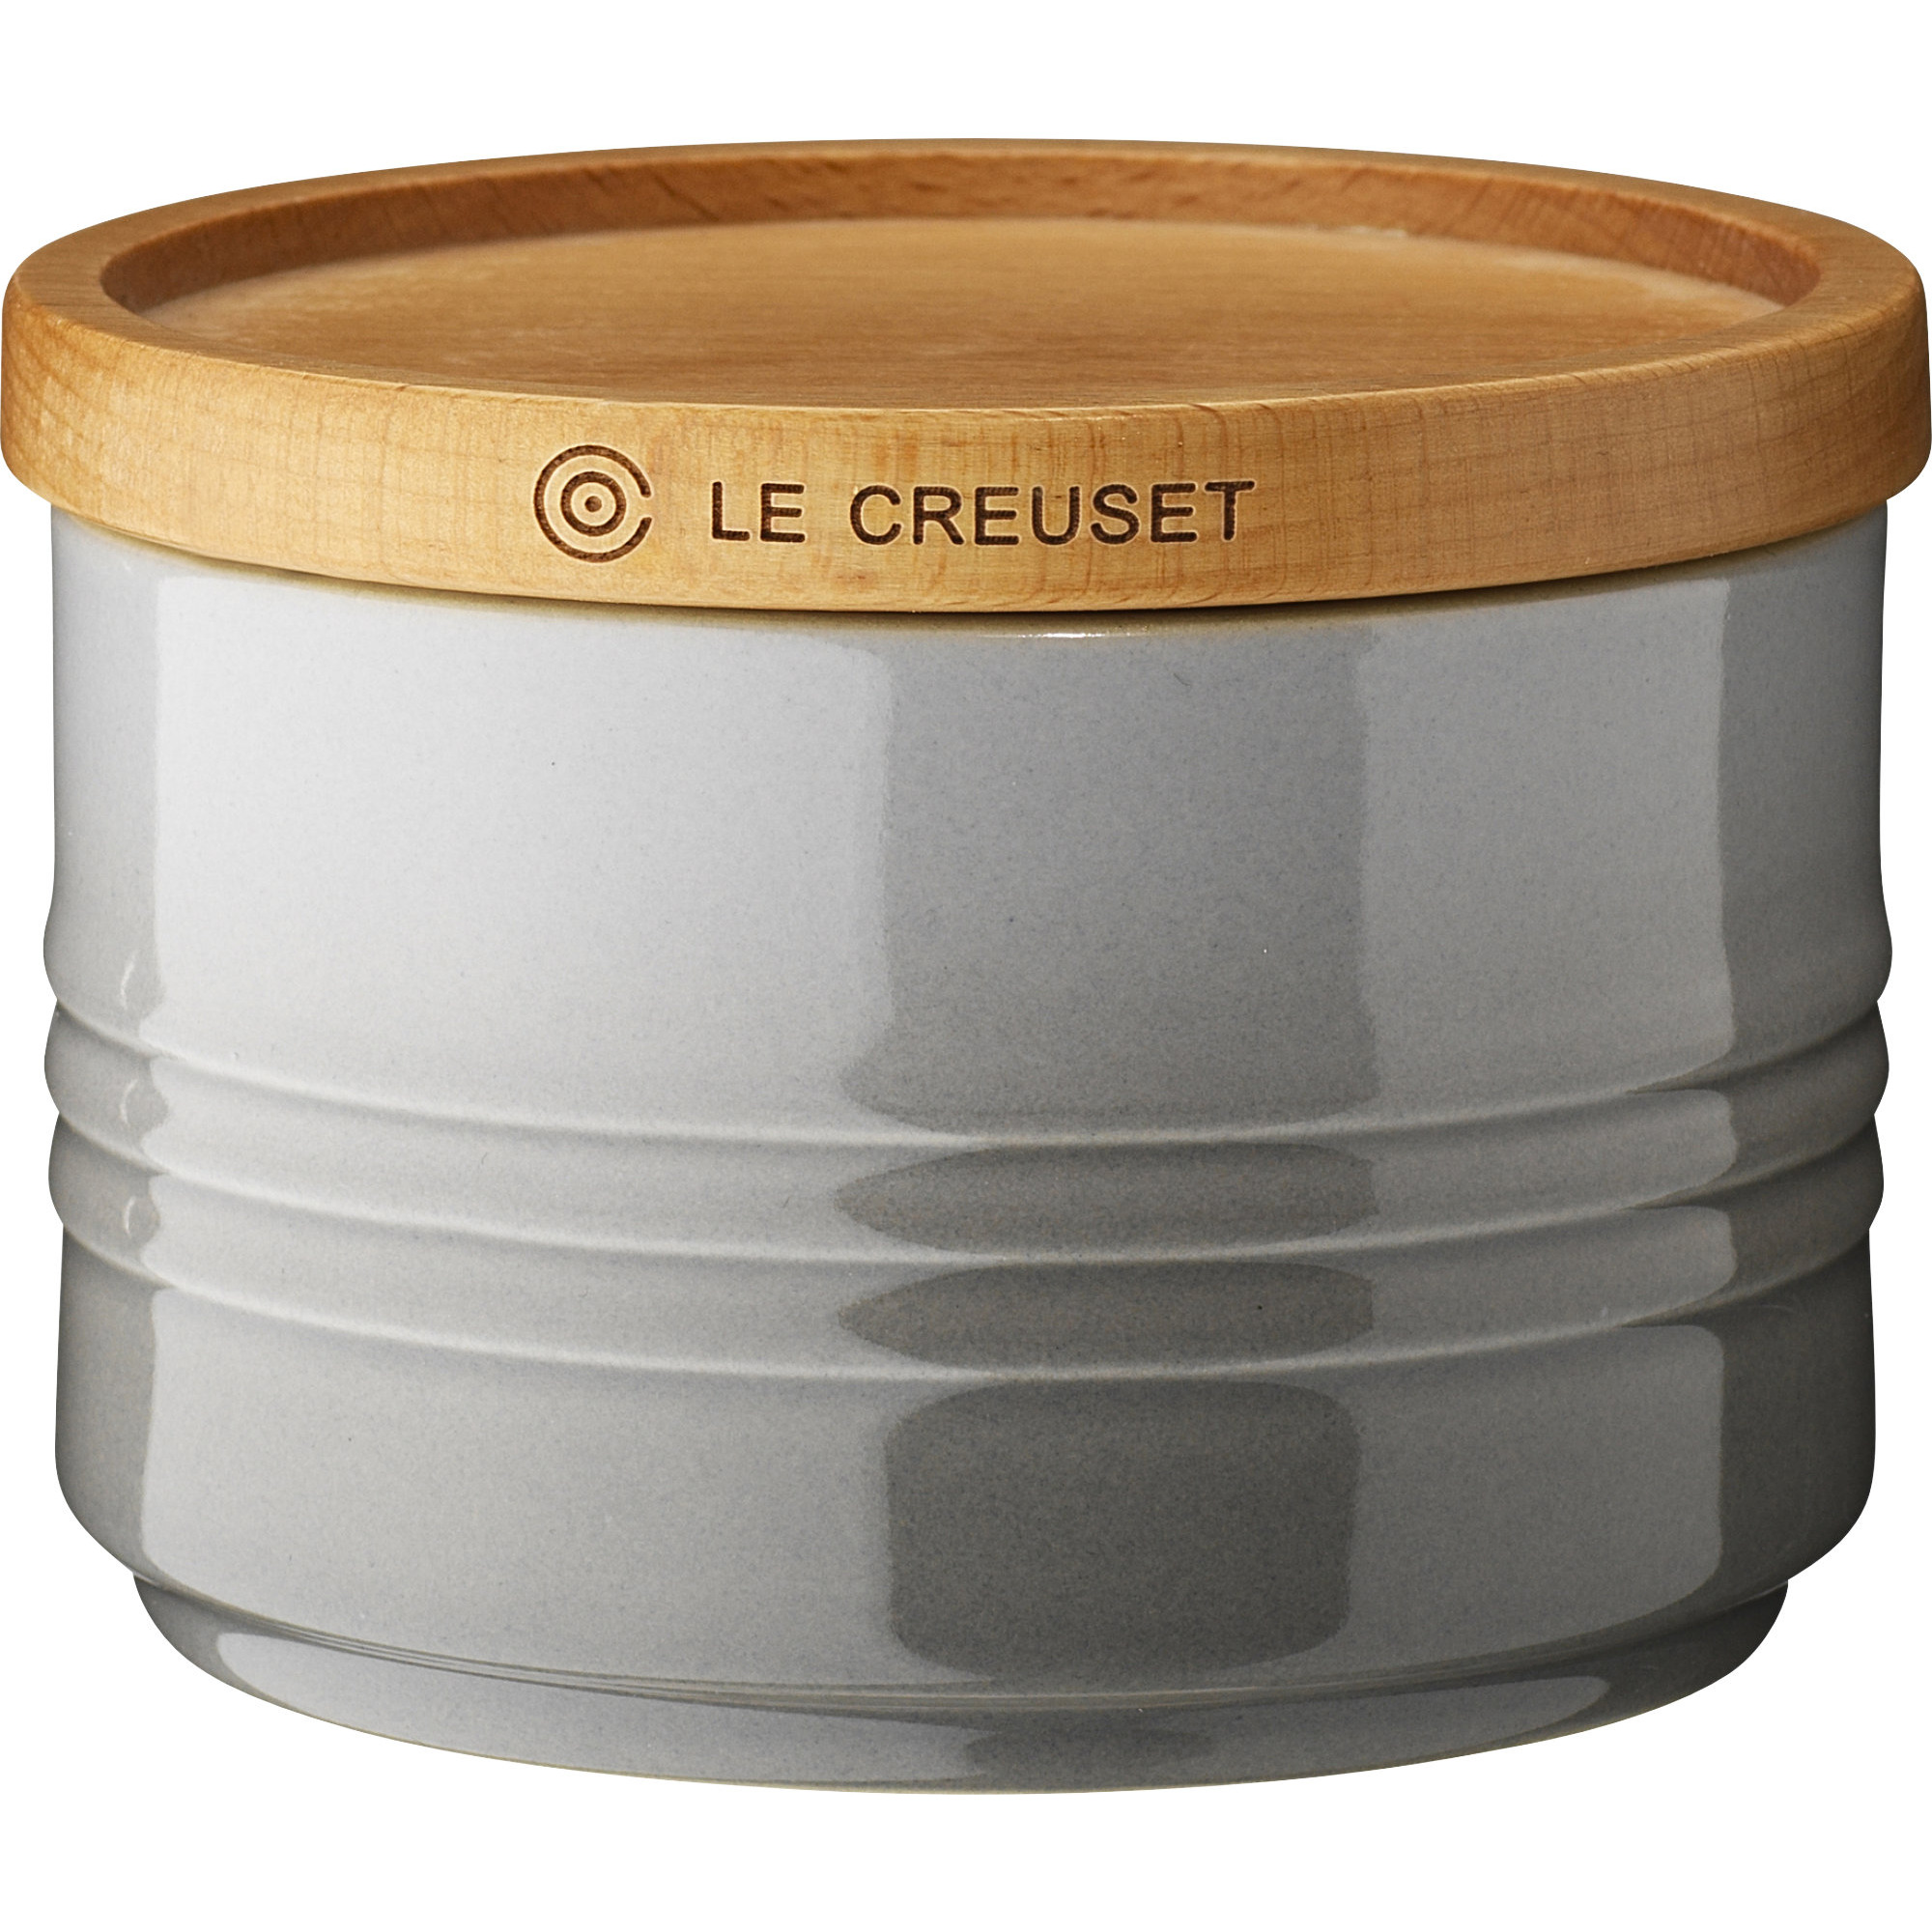 Le Creuset Förvaringsburk 0,34 L/10 cm Mist Gray Lmt. Ed